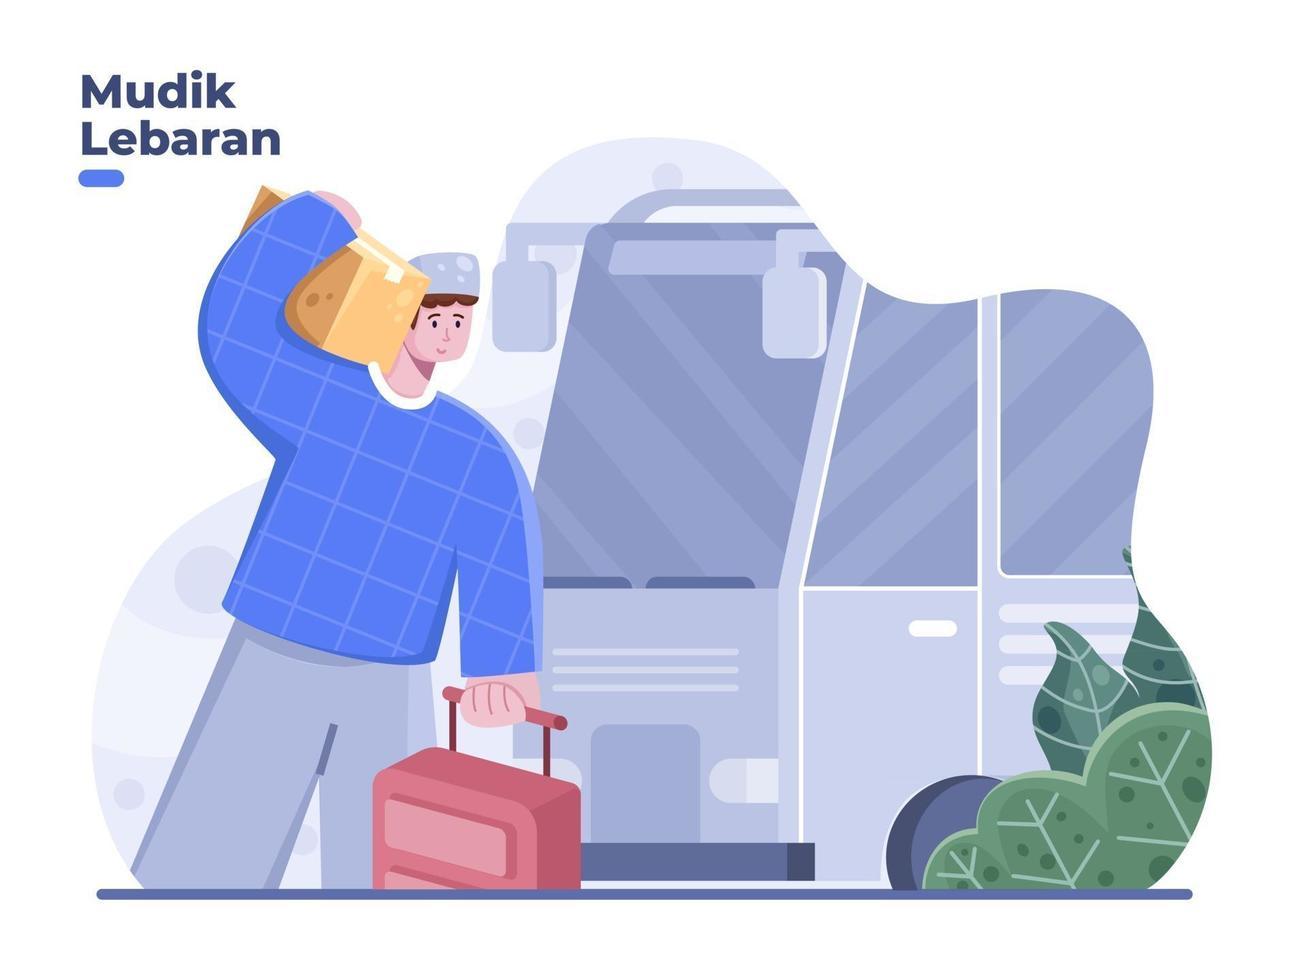 Mudik Lebaran concept translation back to village or hometown before Eid with bus. Eid Al Fitr travelling vector